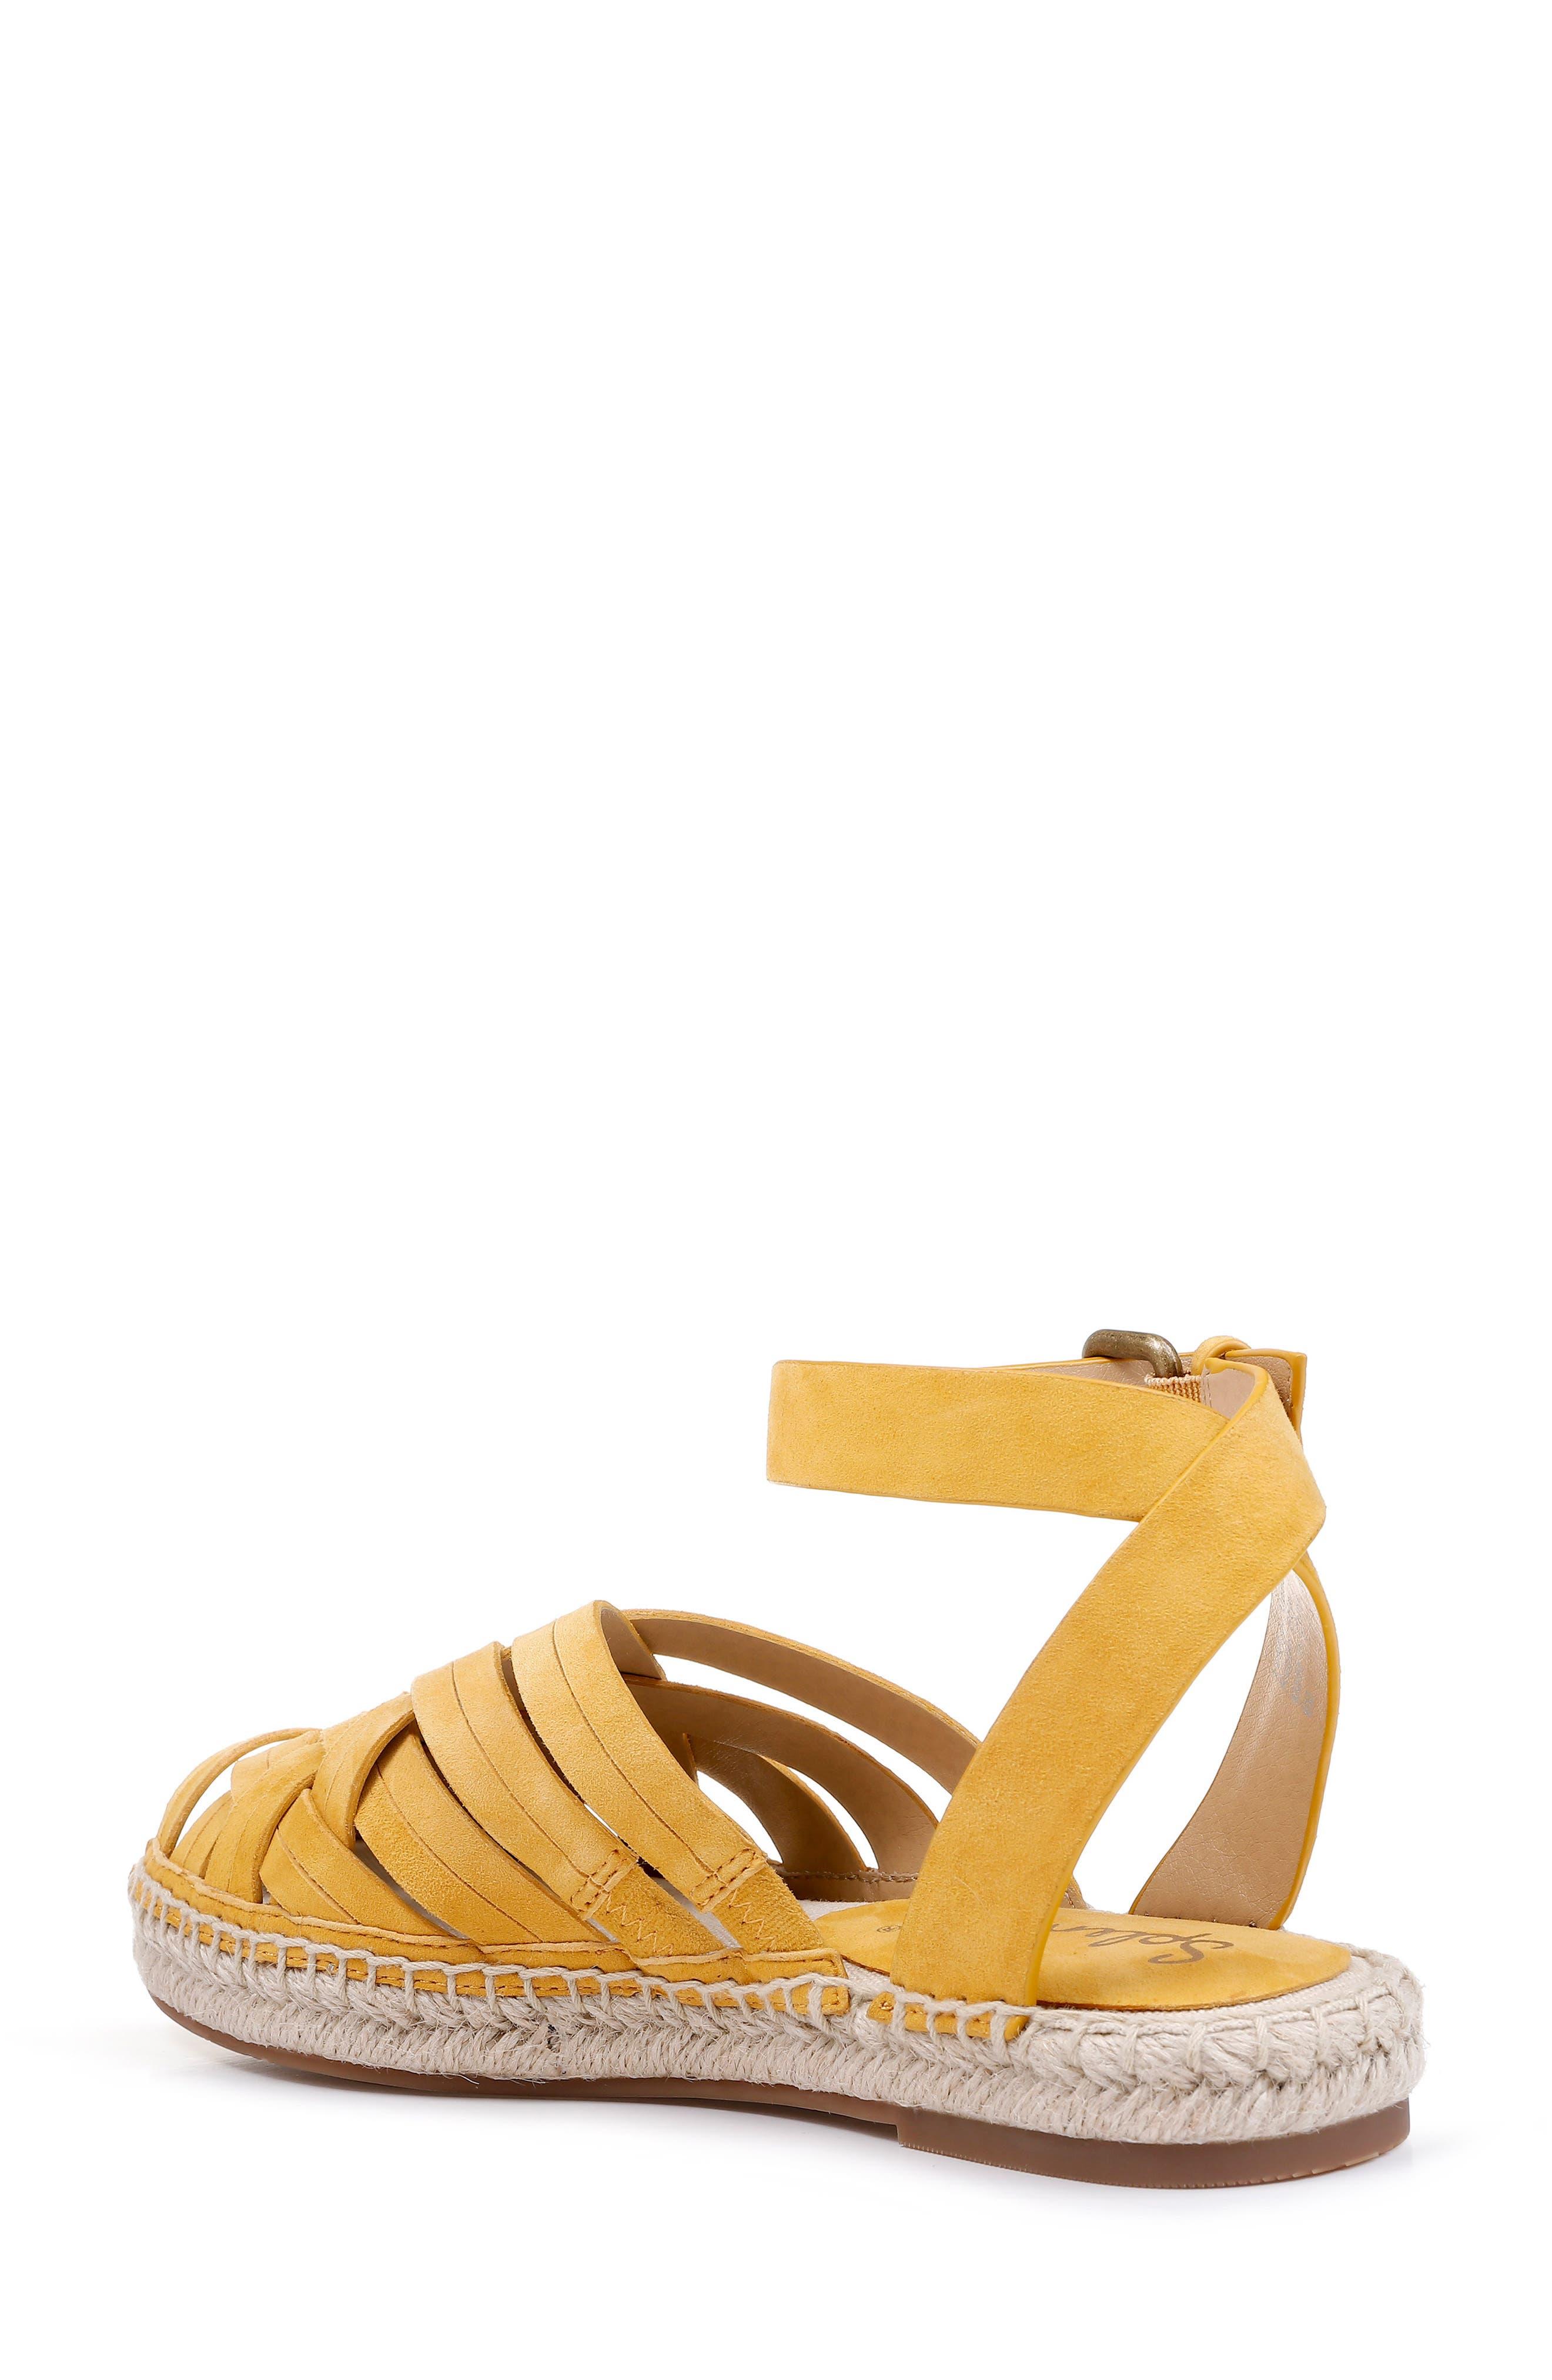 bdf96daea9cd Women s Splendid Sandals